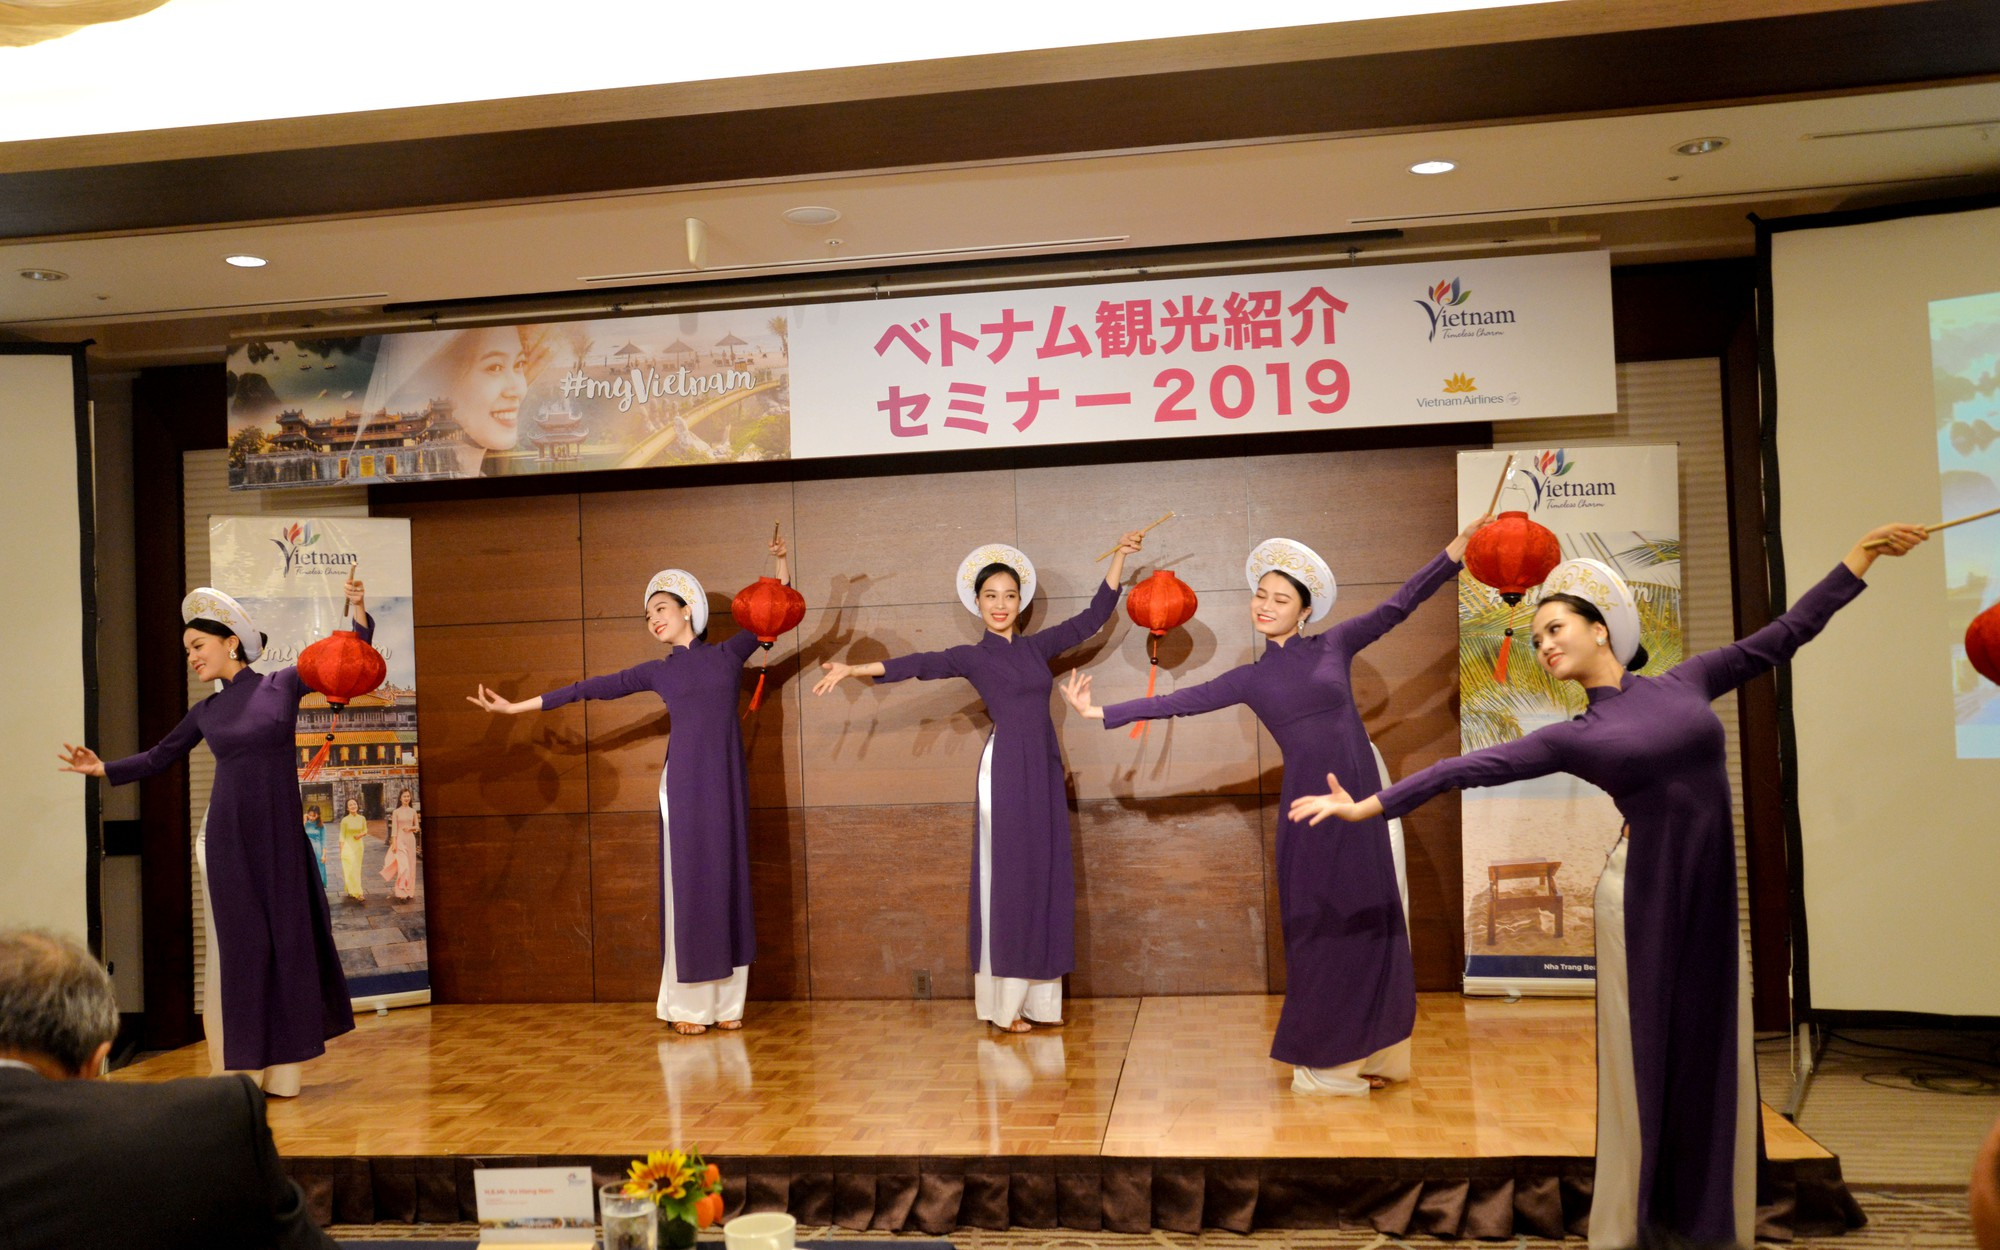 Giới thiệu Du lịch Việt Nam tại Sapporo, tỉnh Hokkaido - Ảnh 10.